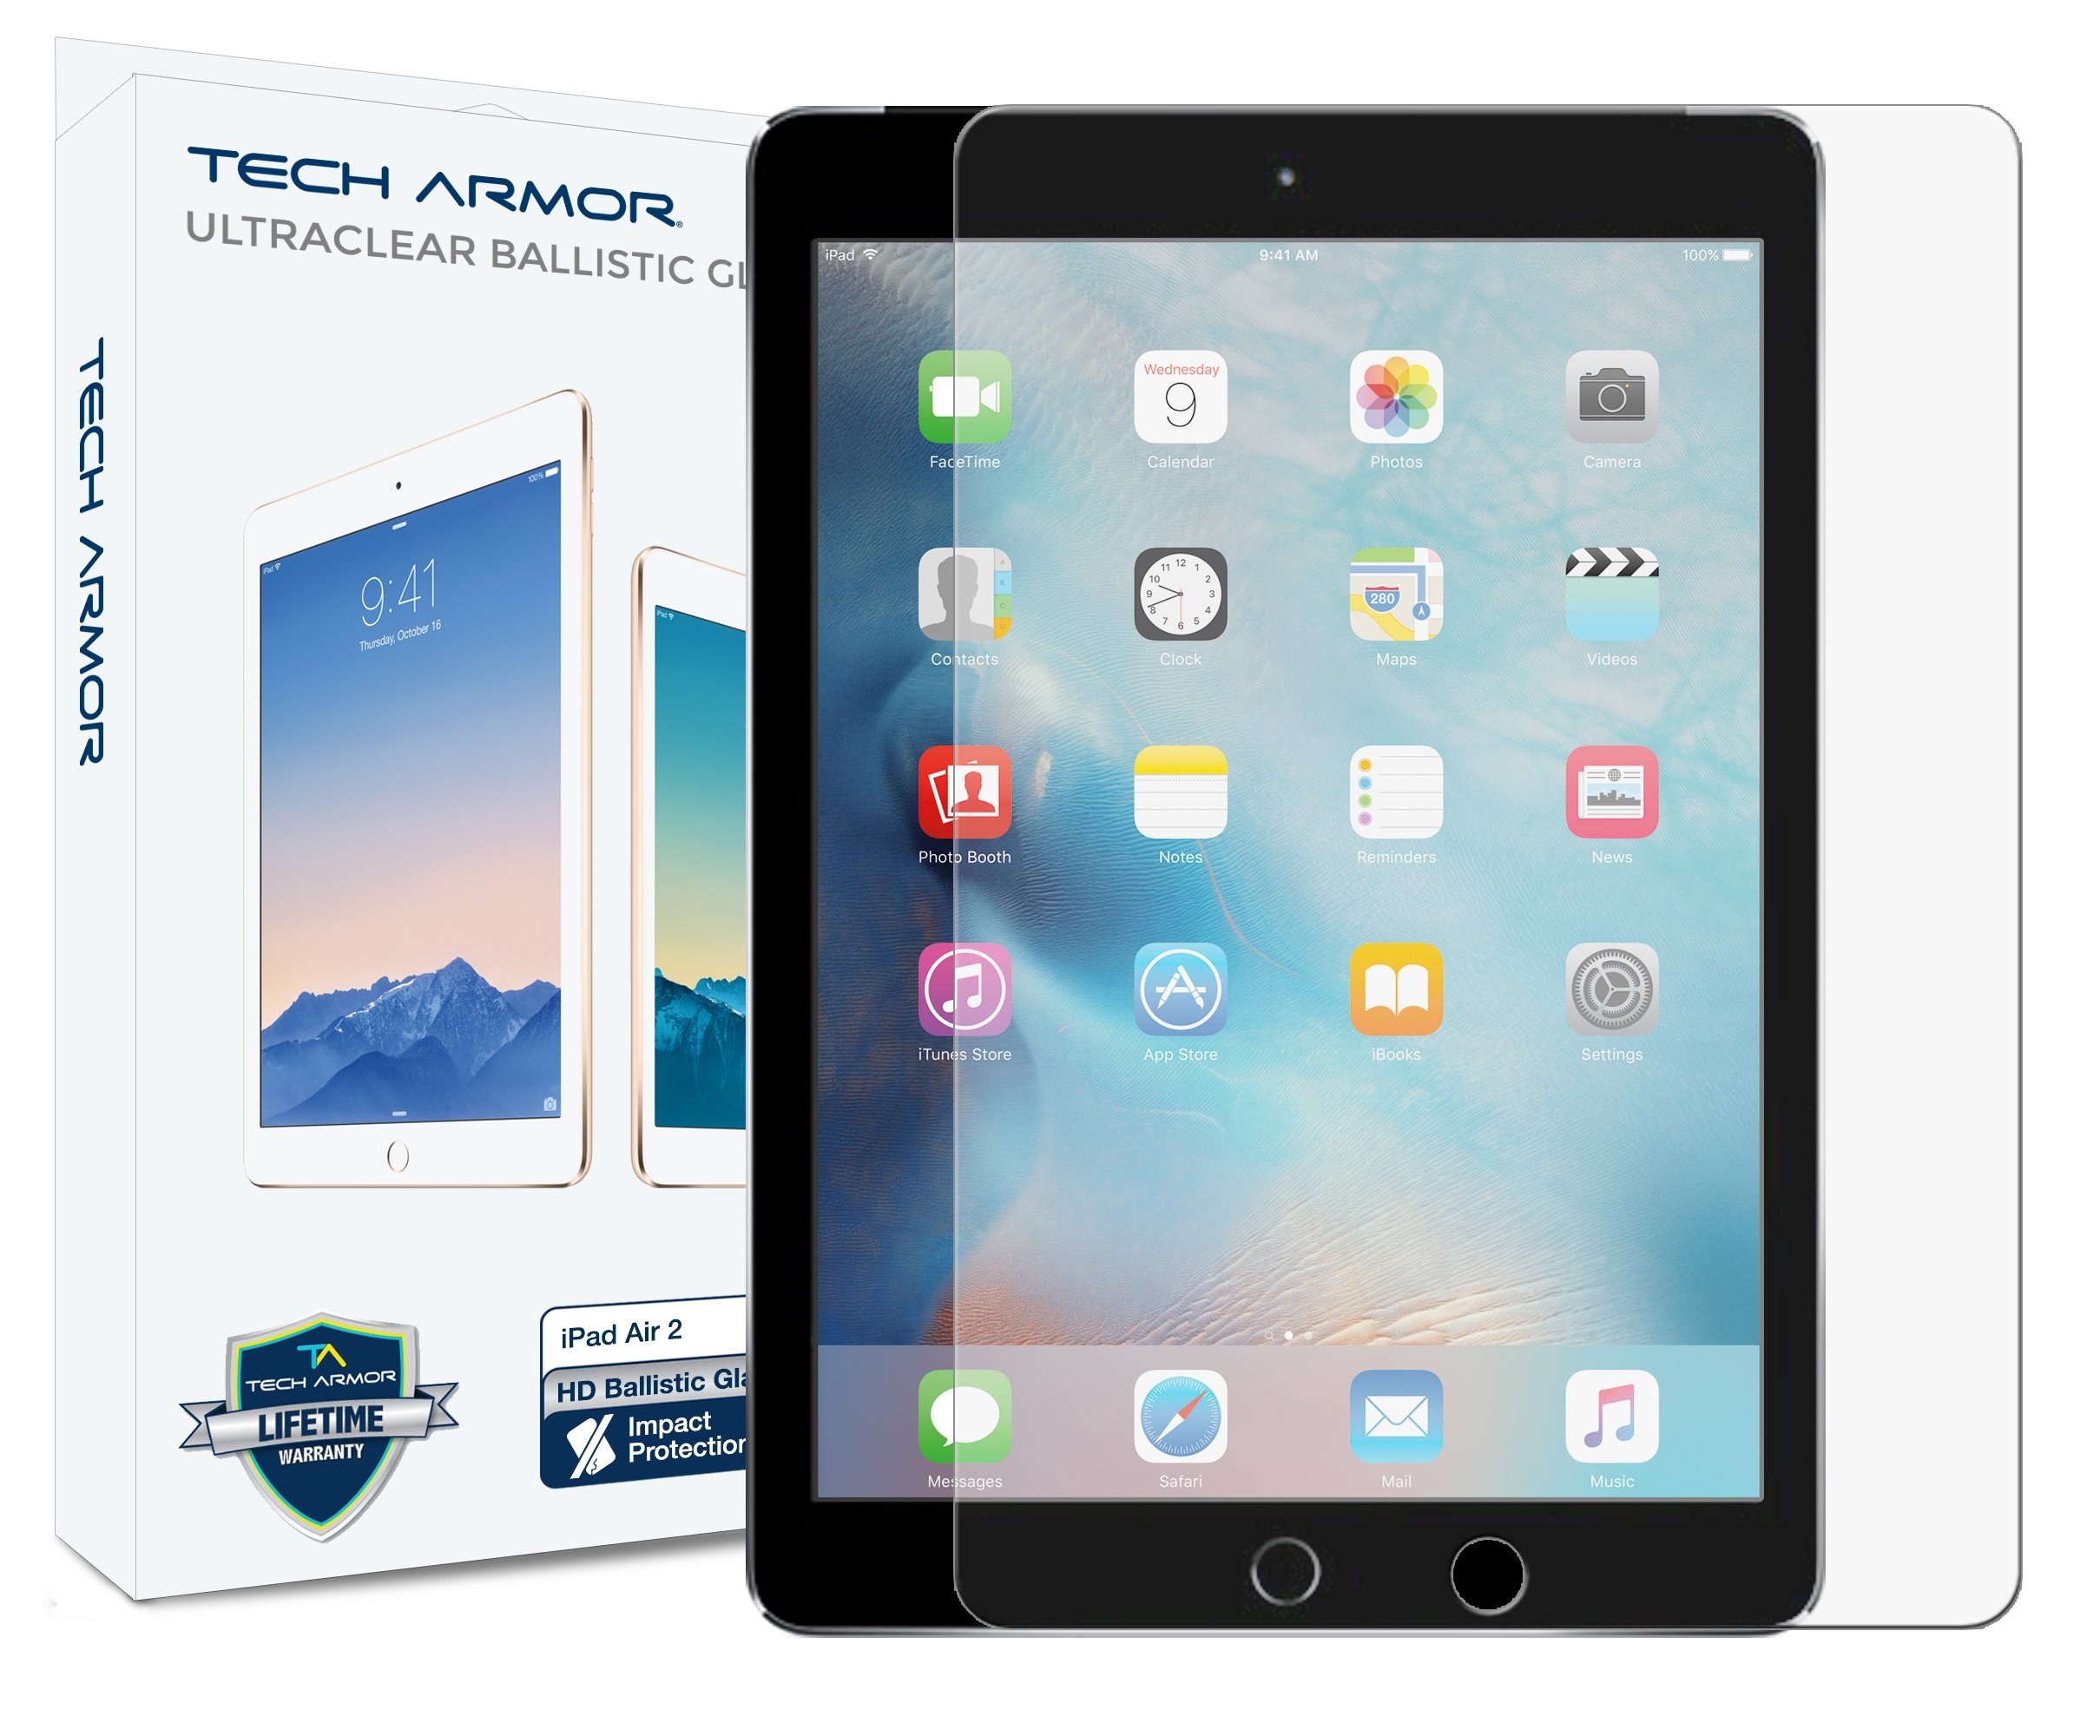 Tech Armor iPad Air Glass Screen Protector, Premium Ballistic Glass Apple iPad Air/Air 2 / NEW iPad 9.7 (2017) Screen Protectors [1]